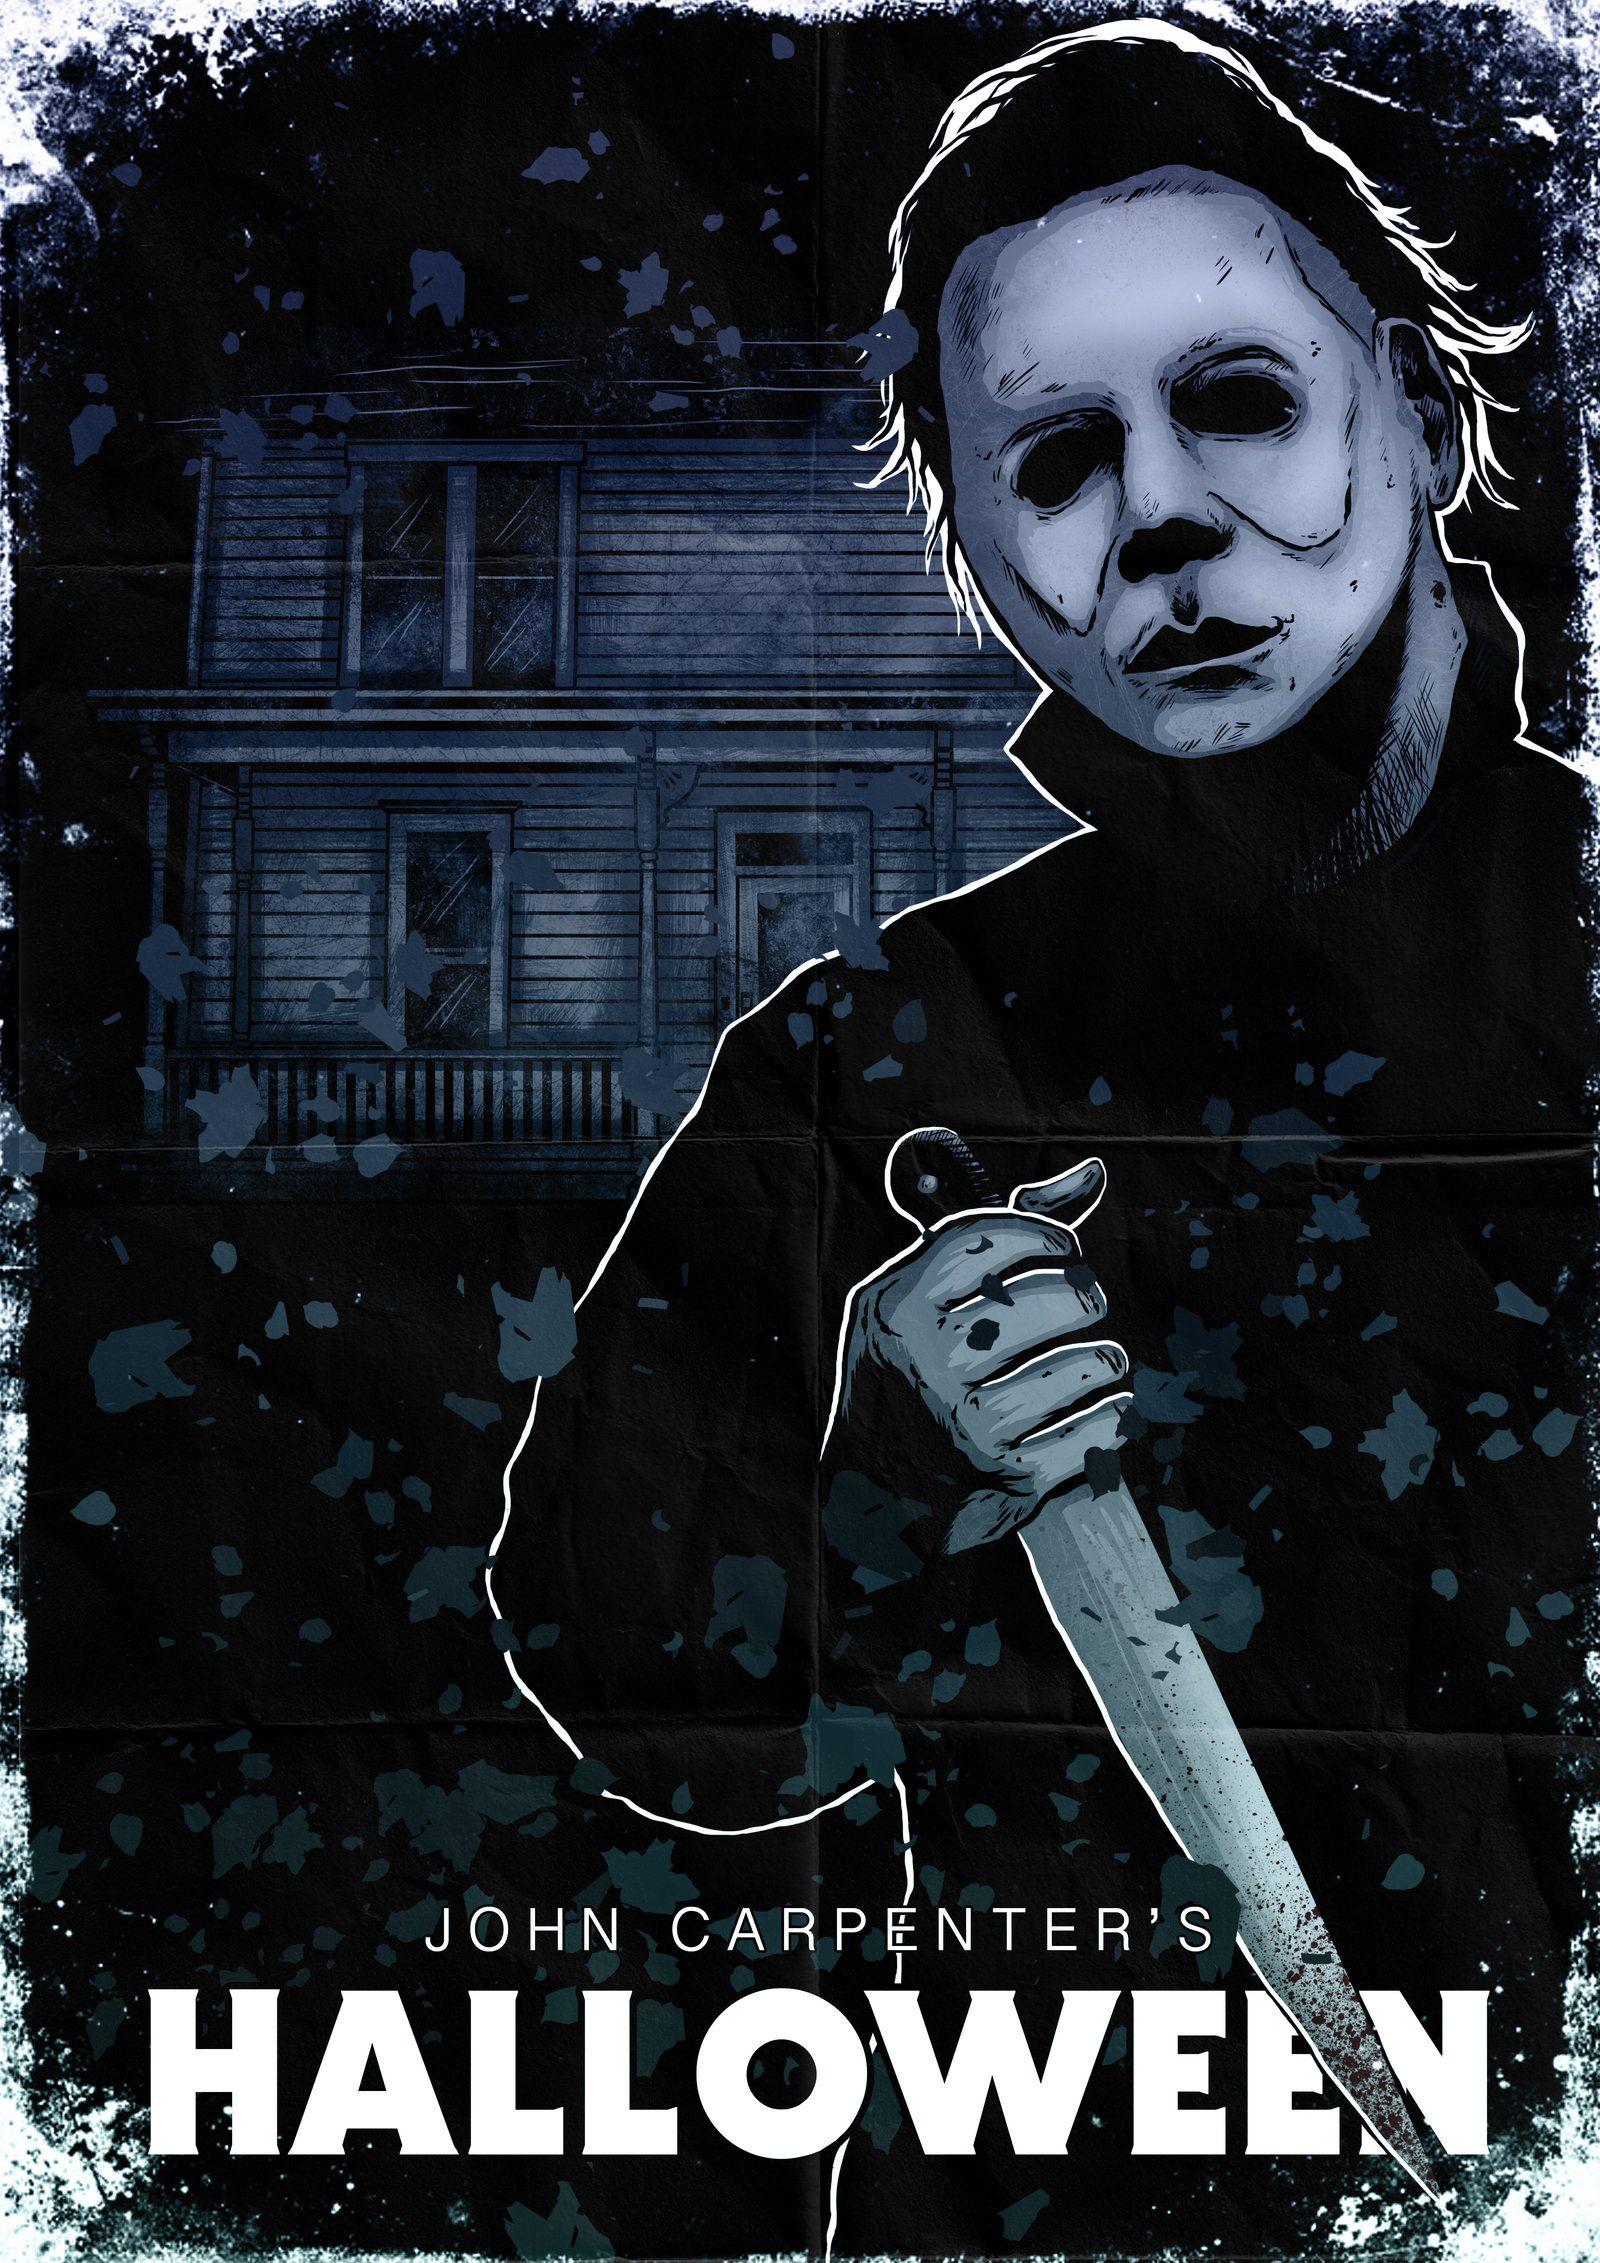 michael myers halloween poster by liquid venom on deviantart - Michael Myers Halloween Decorations